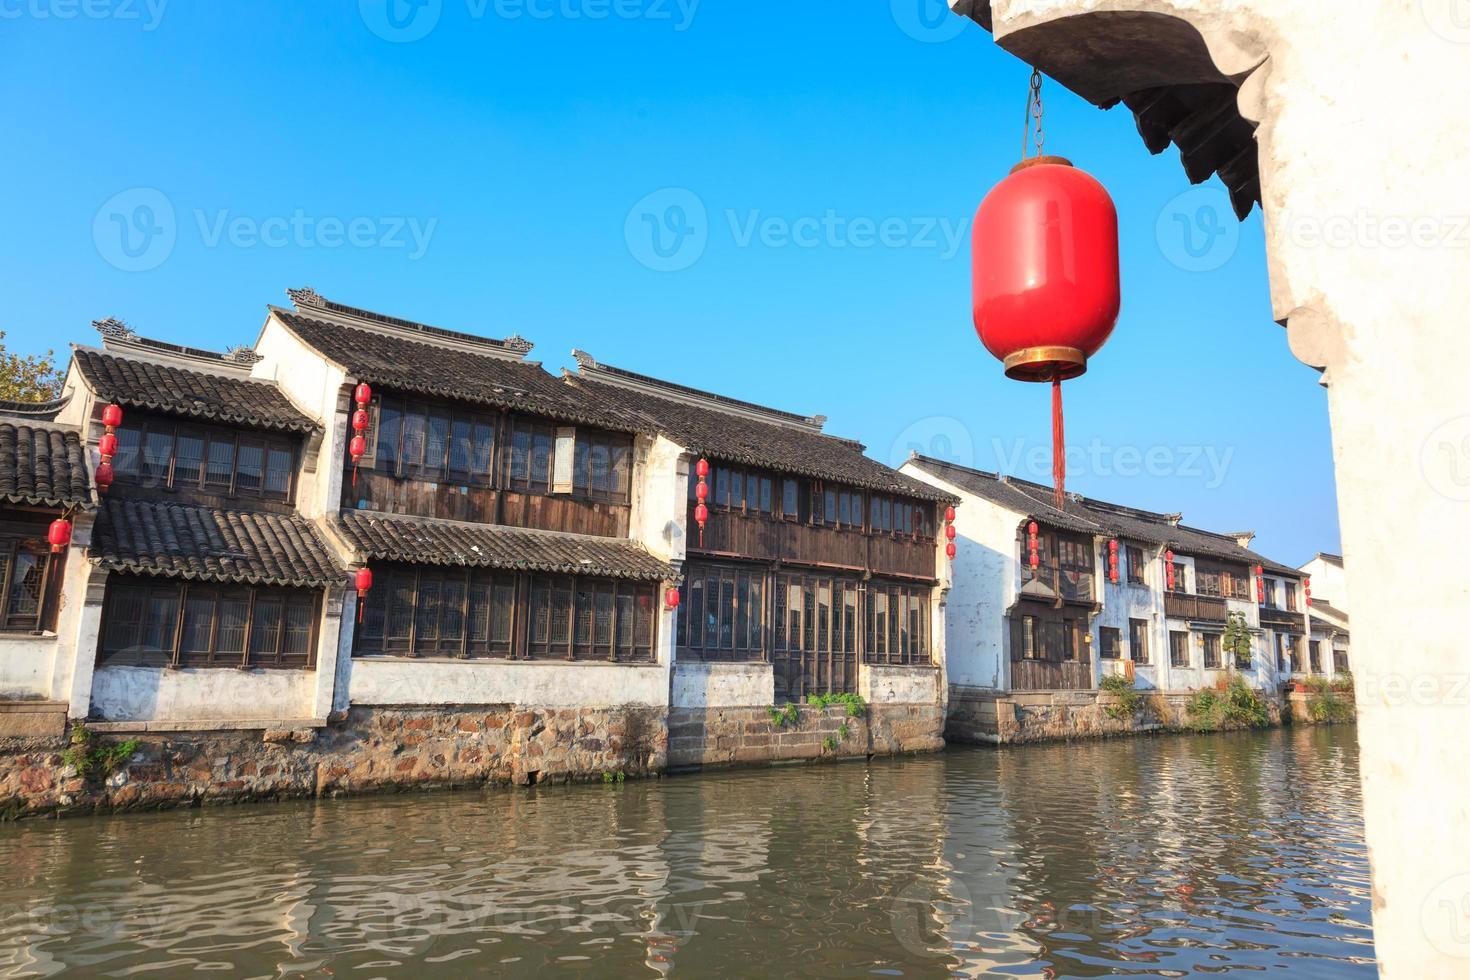 vecchia città tradizionale cinese dal canal grande, suzhou, porcellana foto